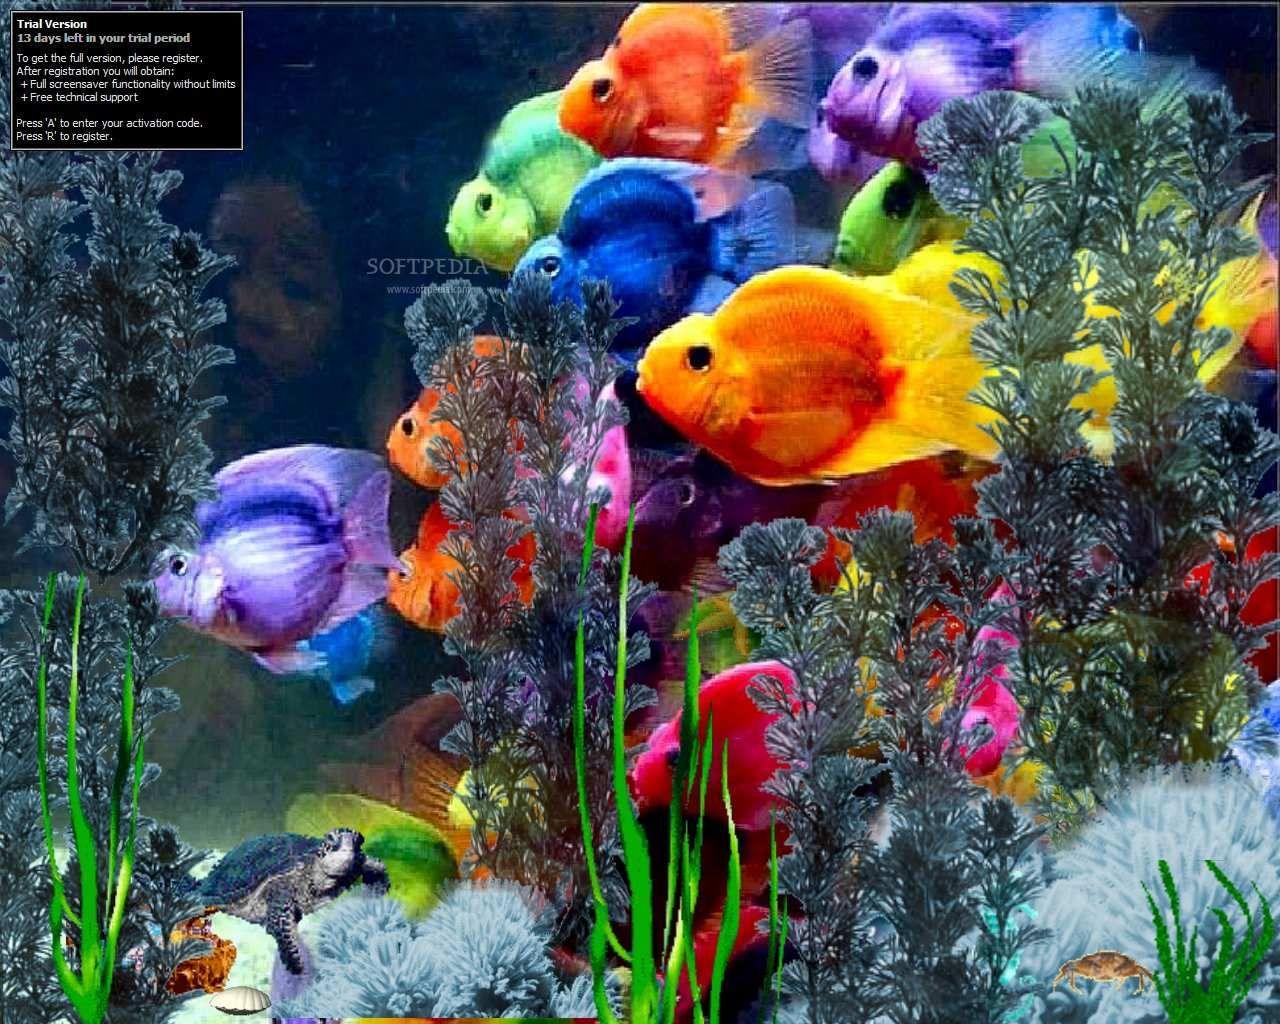 Rainbow fish nature 39 s beauty god 39 s handiwork pinterest for Rainbow fish pictures